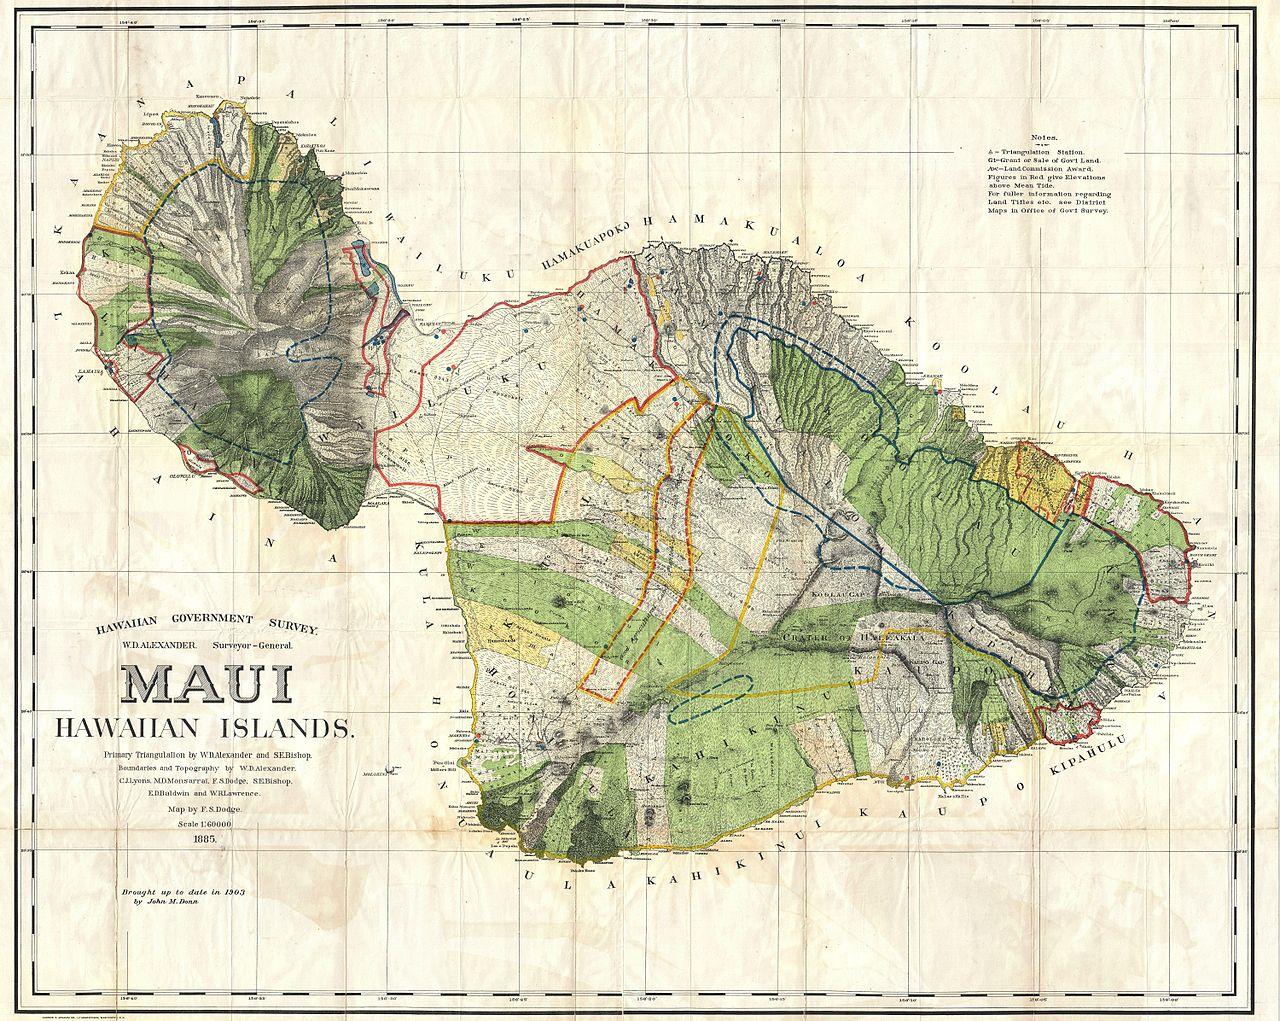 Photo source: wikimedia.org/wikipedia/commons/thumb/6/6e/1885_De_Witt_Alexander_Wall_Map_of_Maui,_Hawaii_-_Geographicus_-_Maui-lo-1885.jpg/1280px-1885_De_Witt_Alexander_Wall_Map_of_Maui,_Hawaii_-_Geographicus_-_Maui-lo-1885.jpg